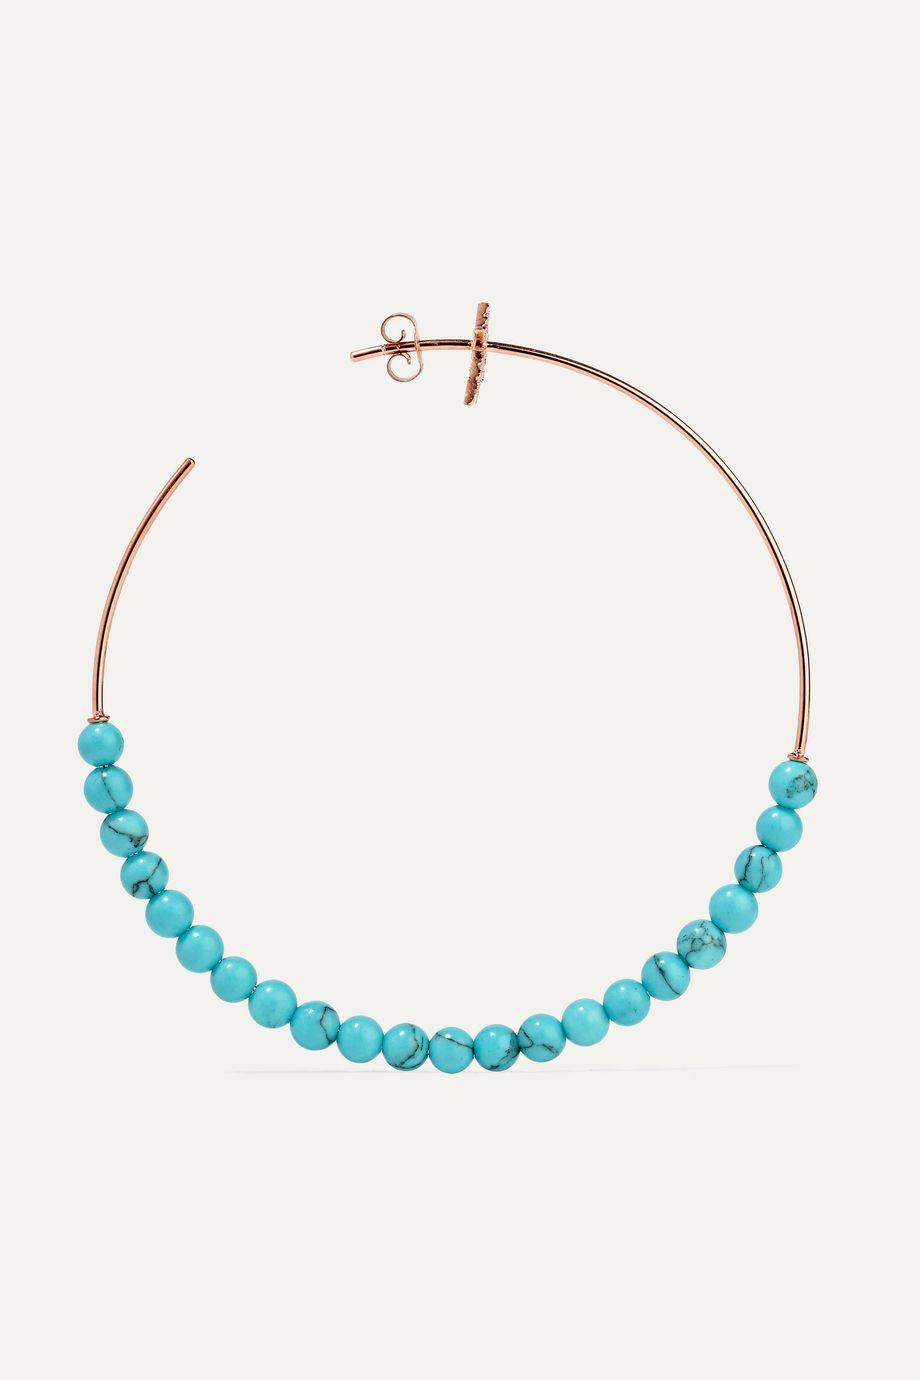 Diane Kordas 18-karat rose gold, diamond and turquoise hoop earrings